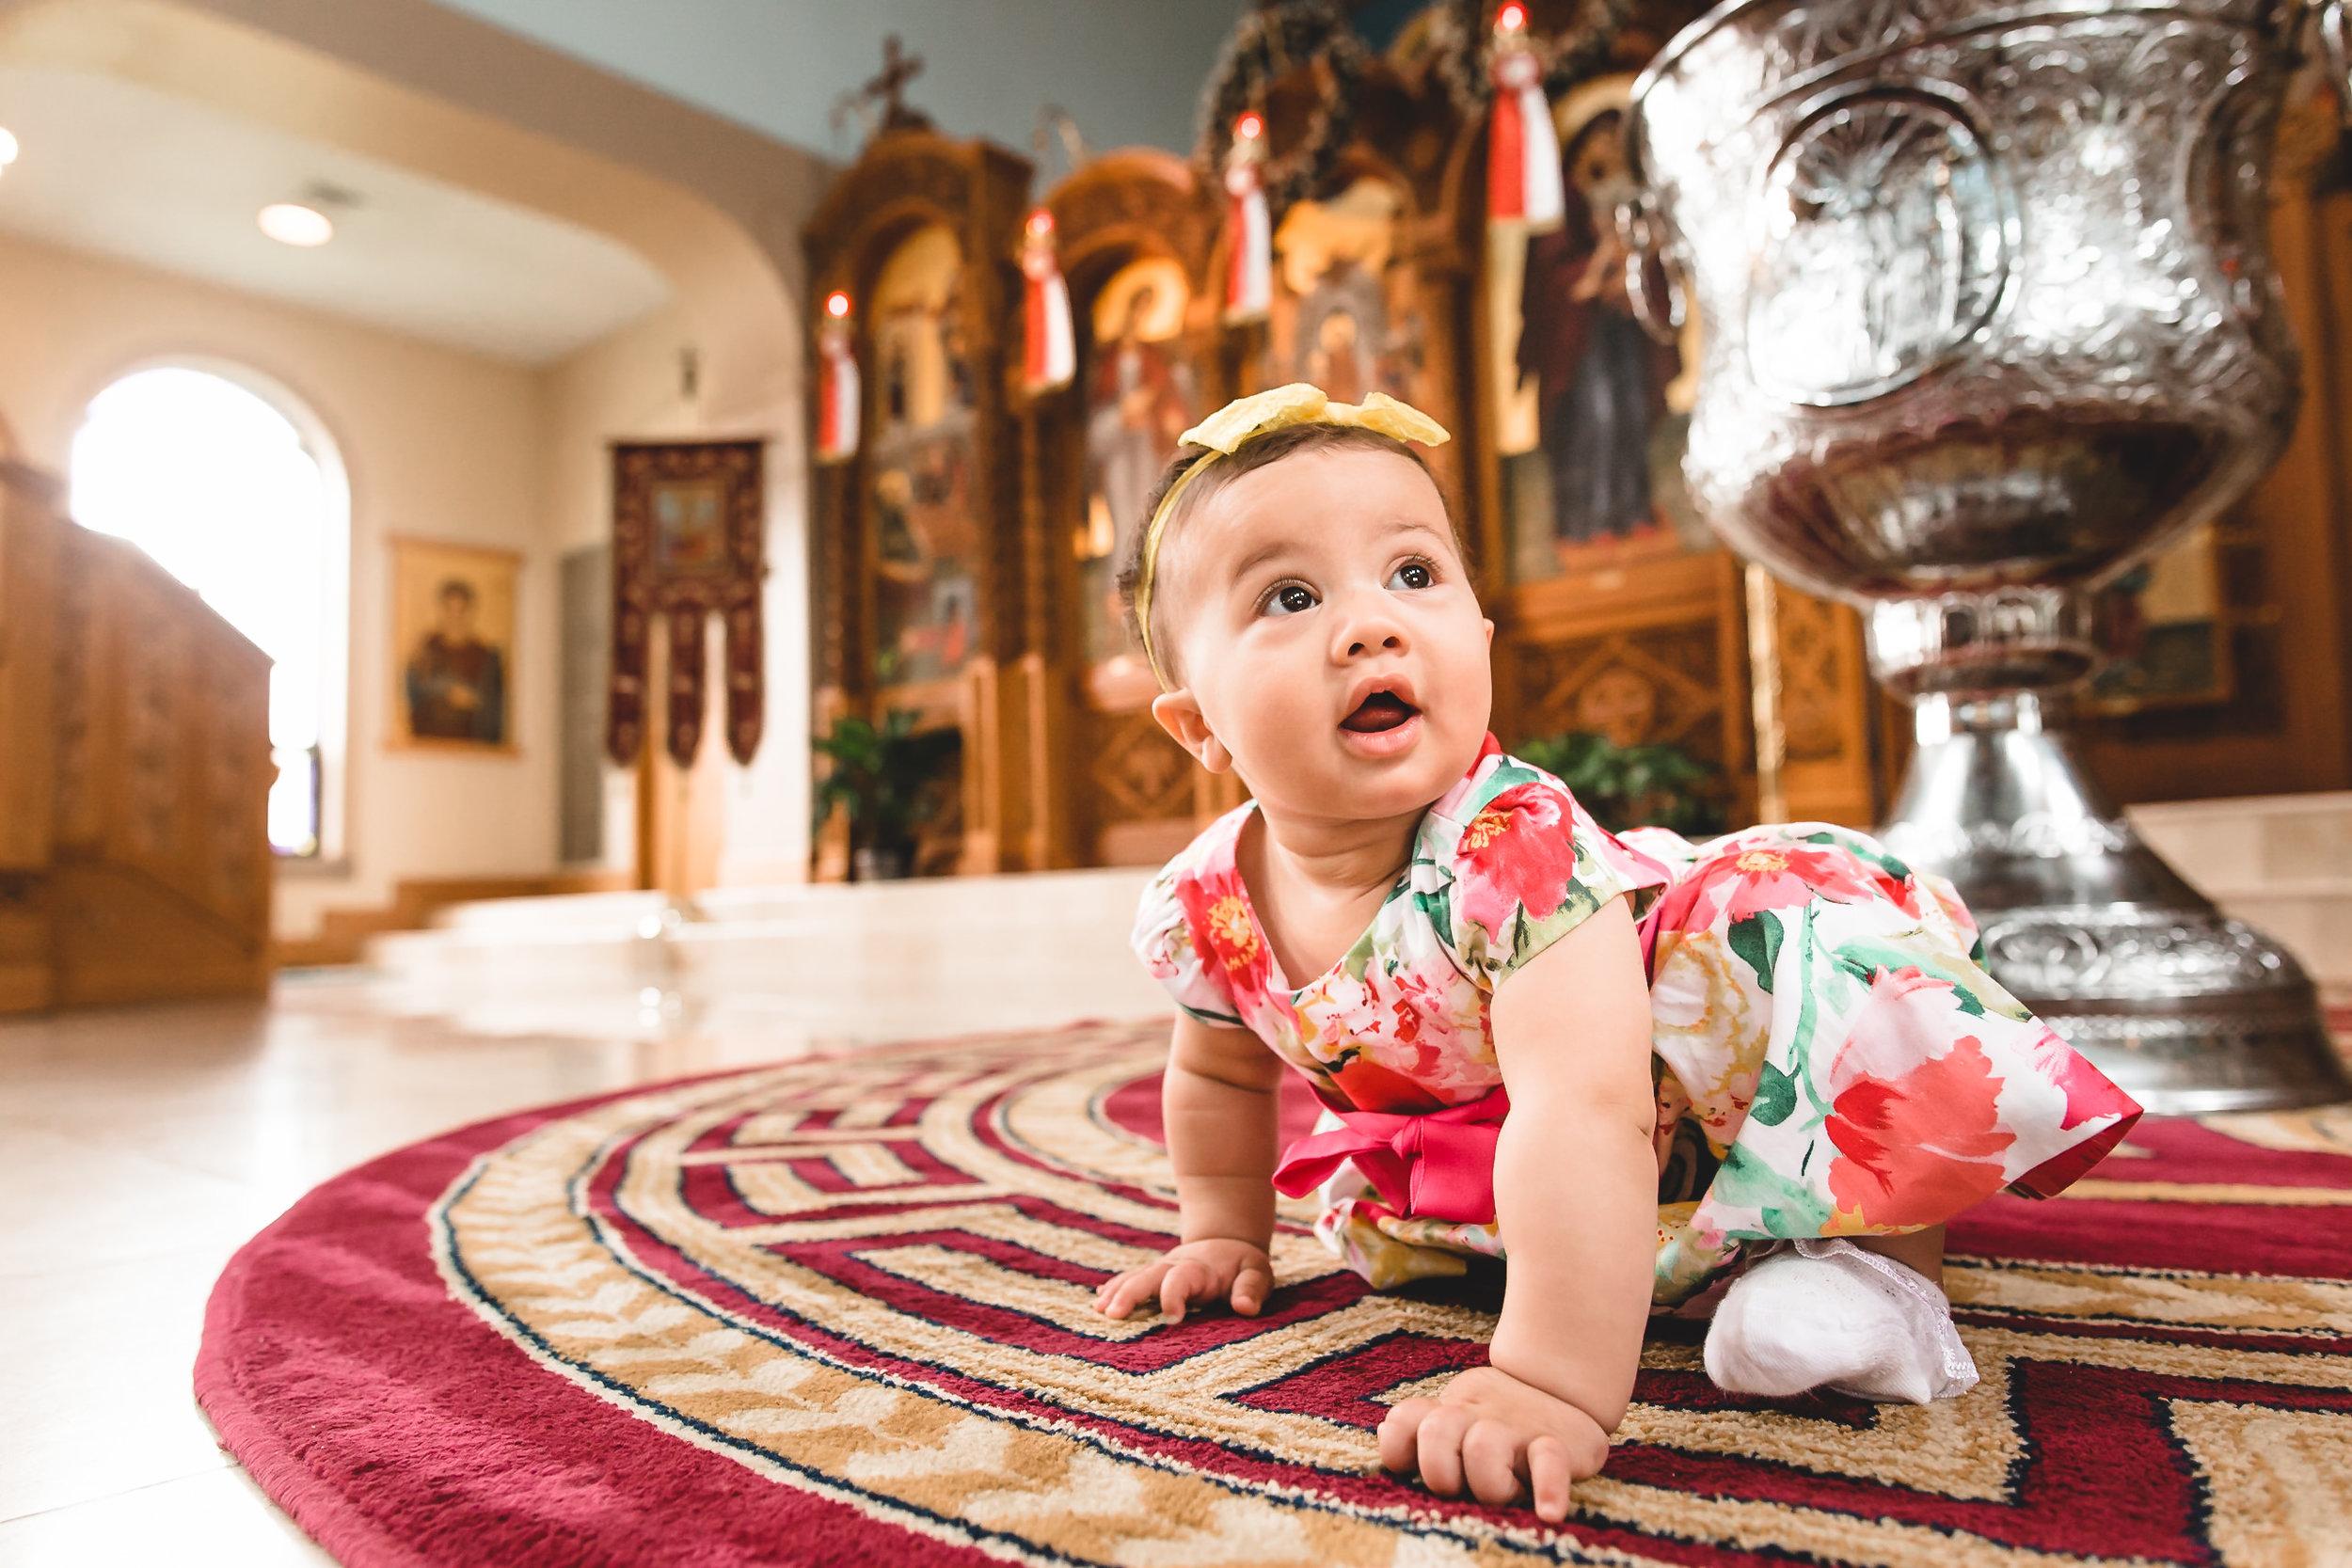 Kimisis Tis Theotokou baptism holmdel nj daniel nydick (1 of 36).jpg